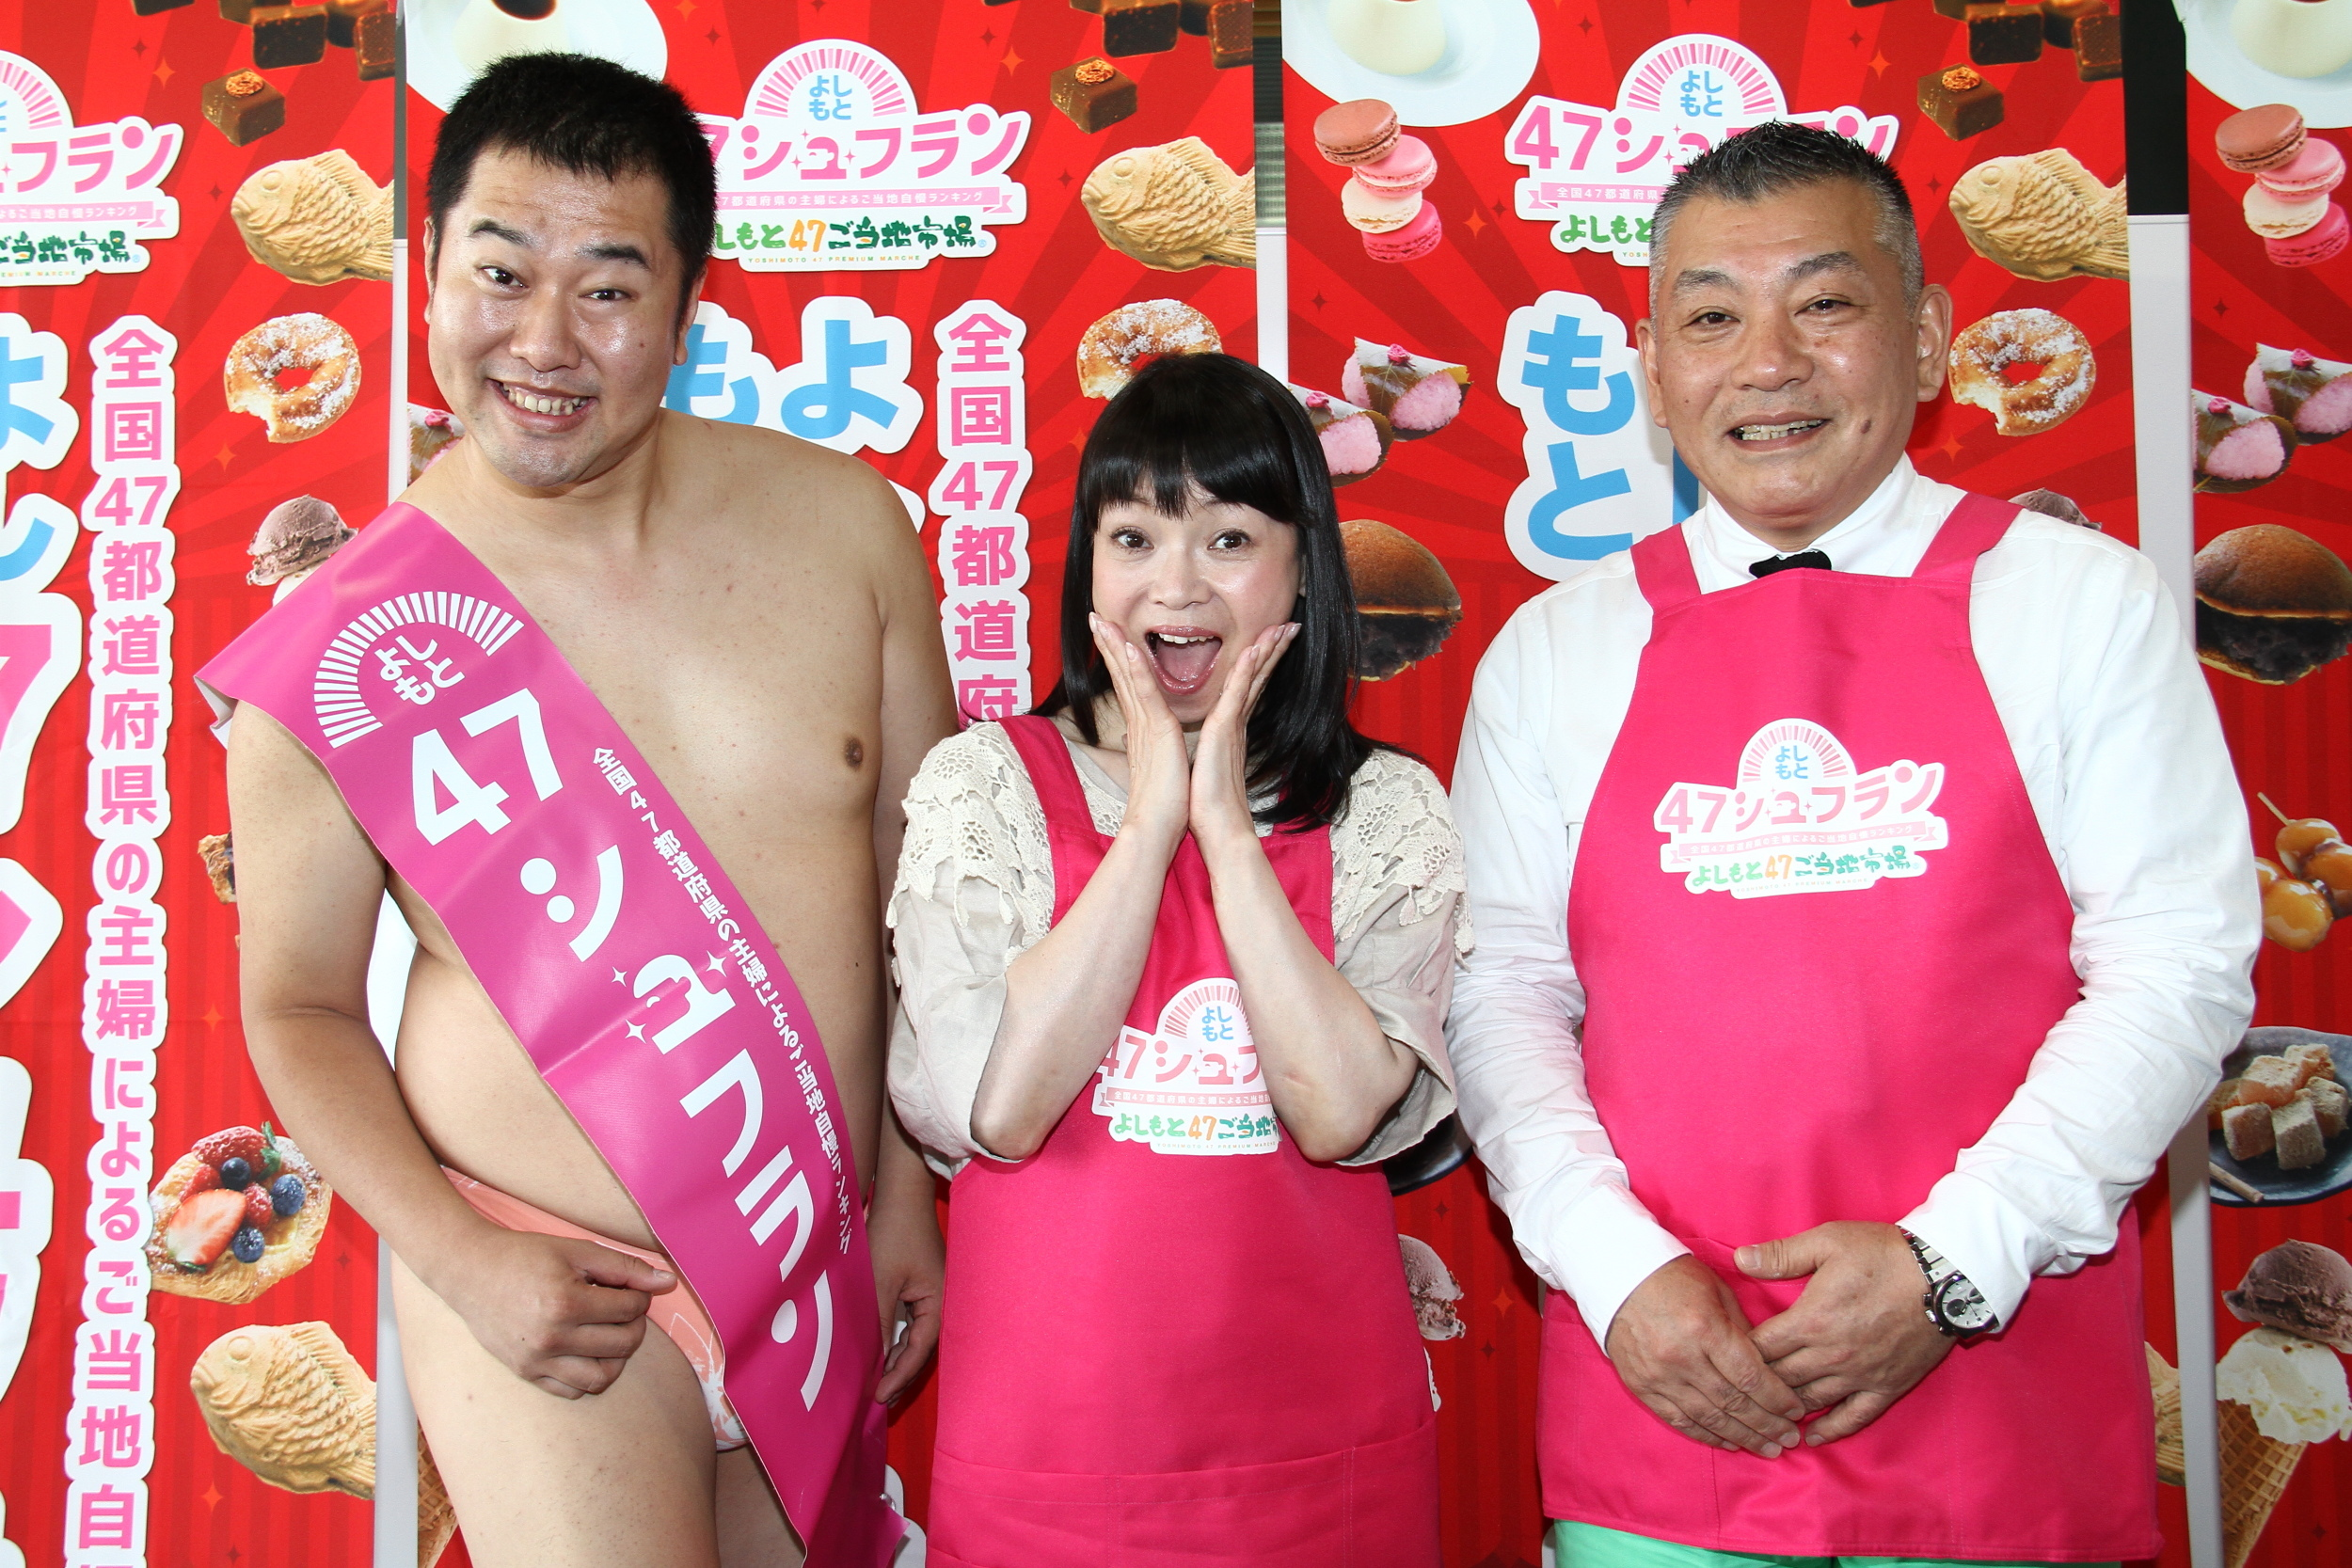 http://news.yoshimoto.co.jp/photos/uncategorized/2015/05/28/20150528172400-01be6af5eb78c0b07d8f314066e863f48f59d7d7.jpg